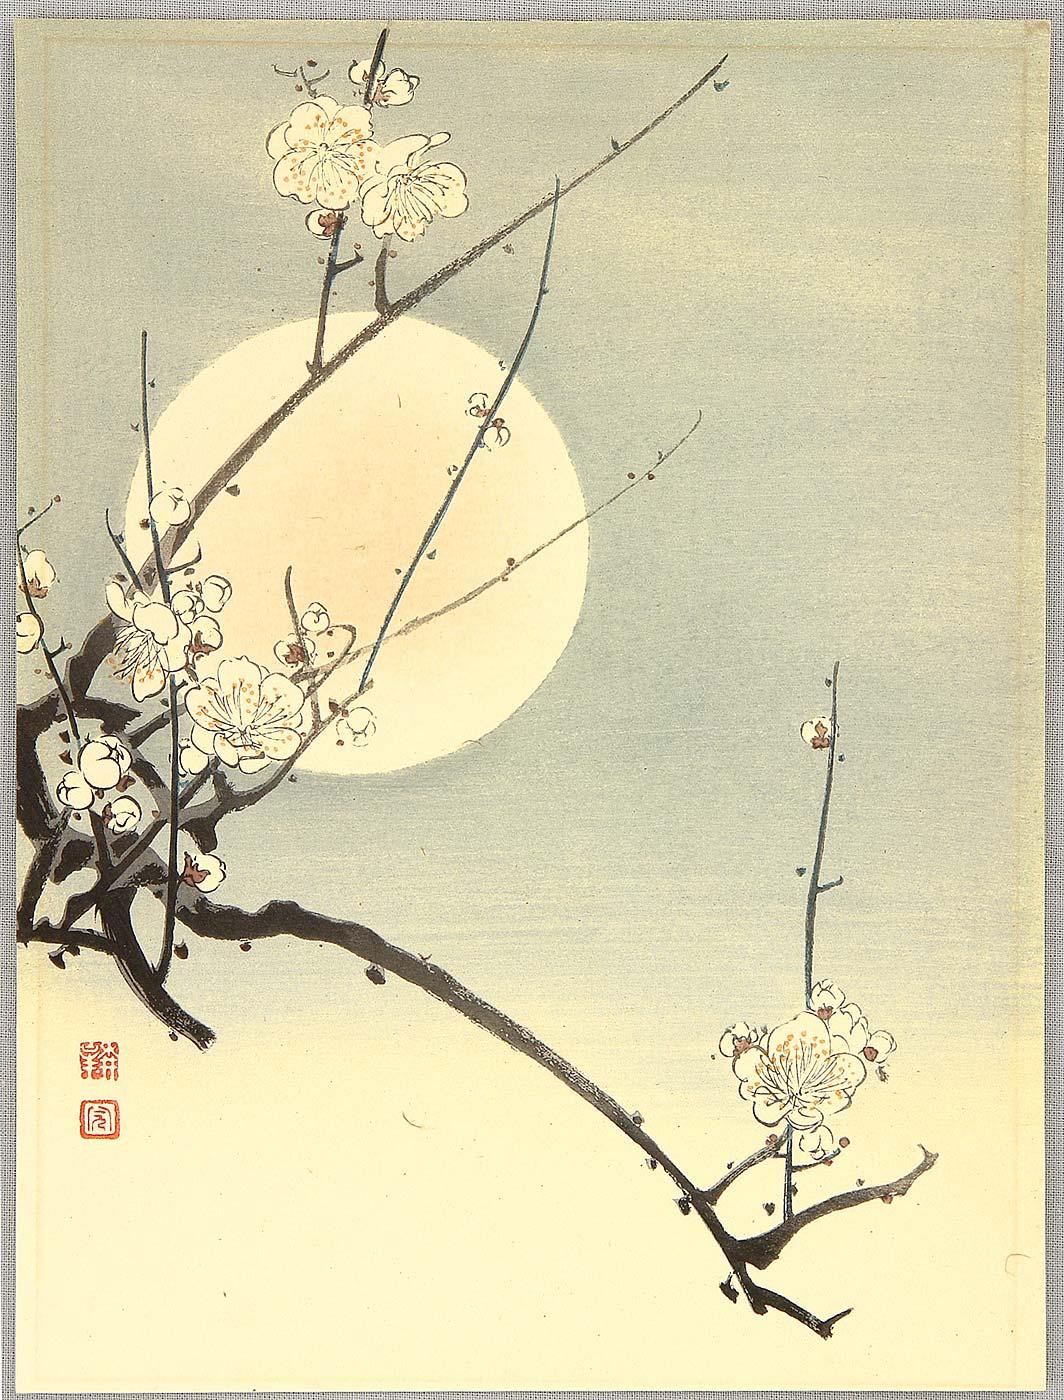 Слива и луна. Гравюра мастера Кохо, 1930-е годы